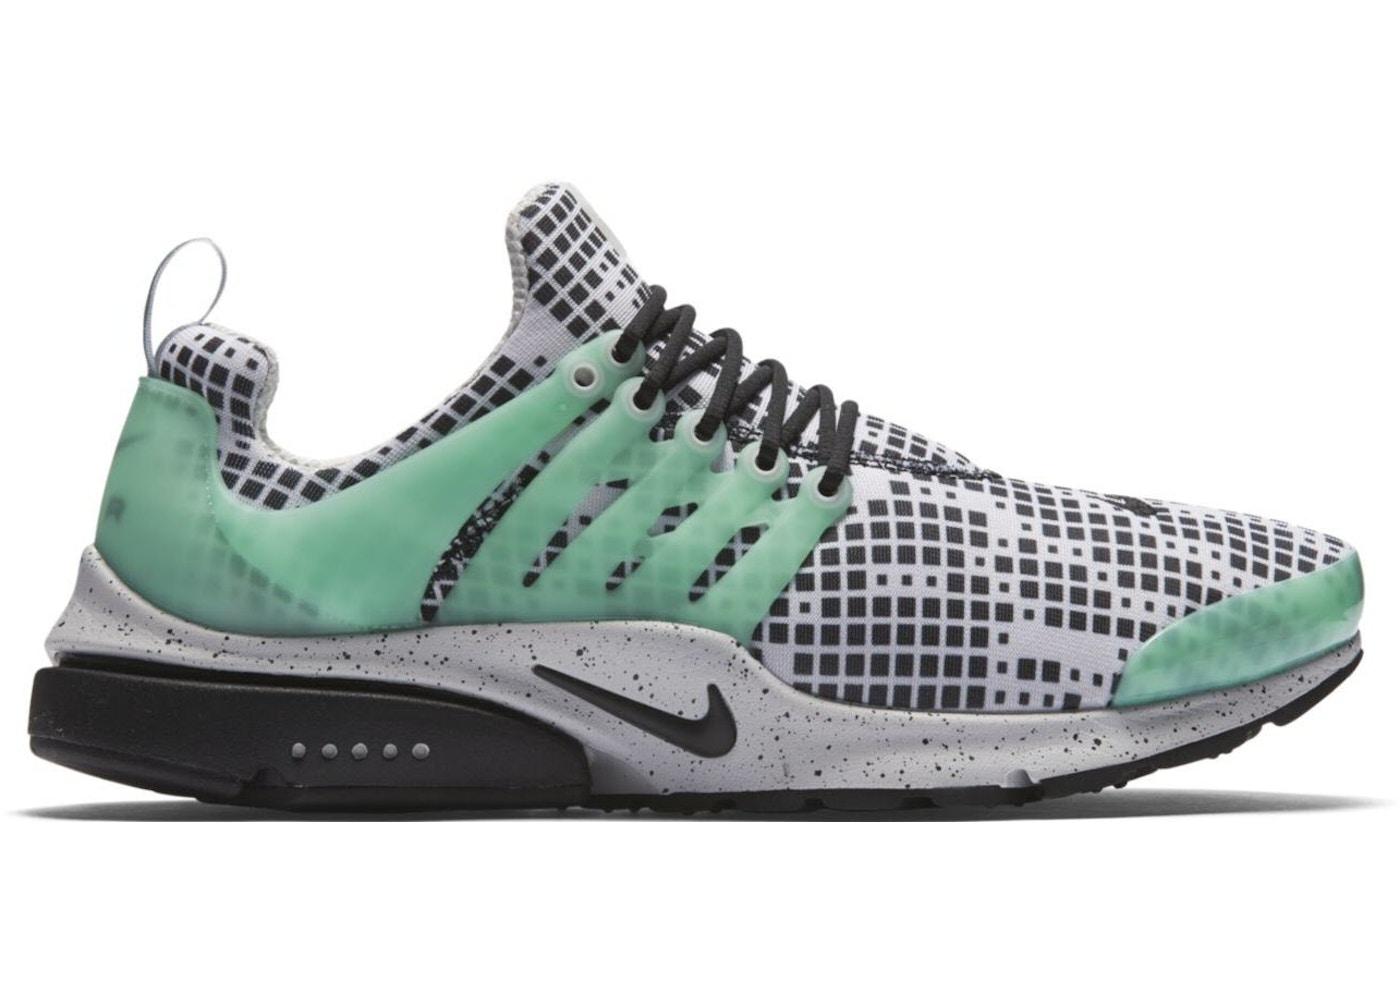 sports shoes a5e66 04a04 Air Presto Green Glow Pixels - 819521-103